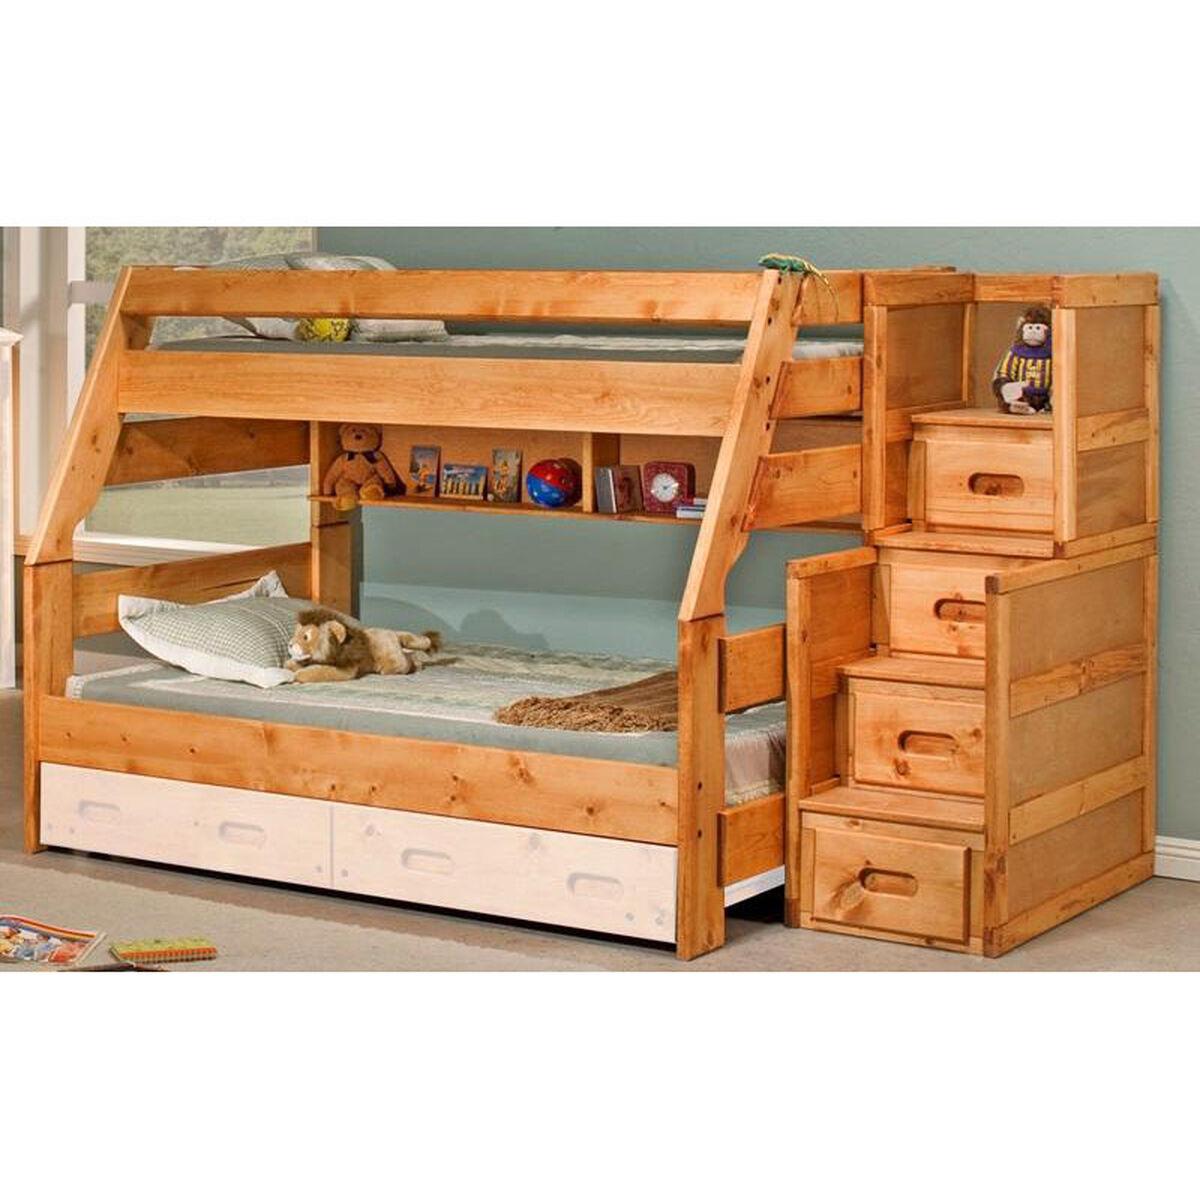 Pine Bunk Bed Twin Over Full 3544720 4754 Bizchair Com